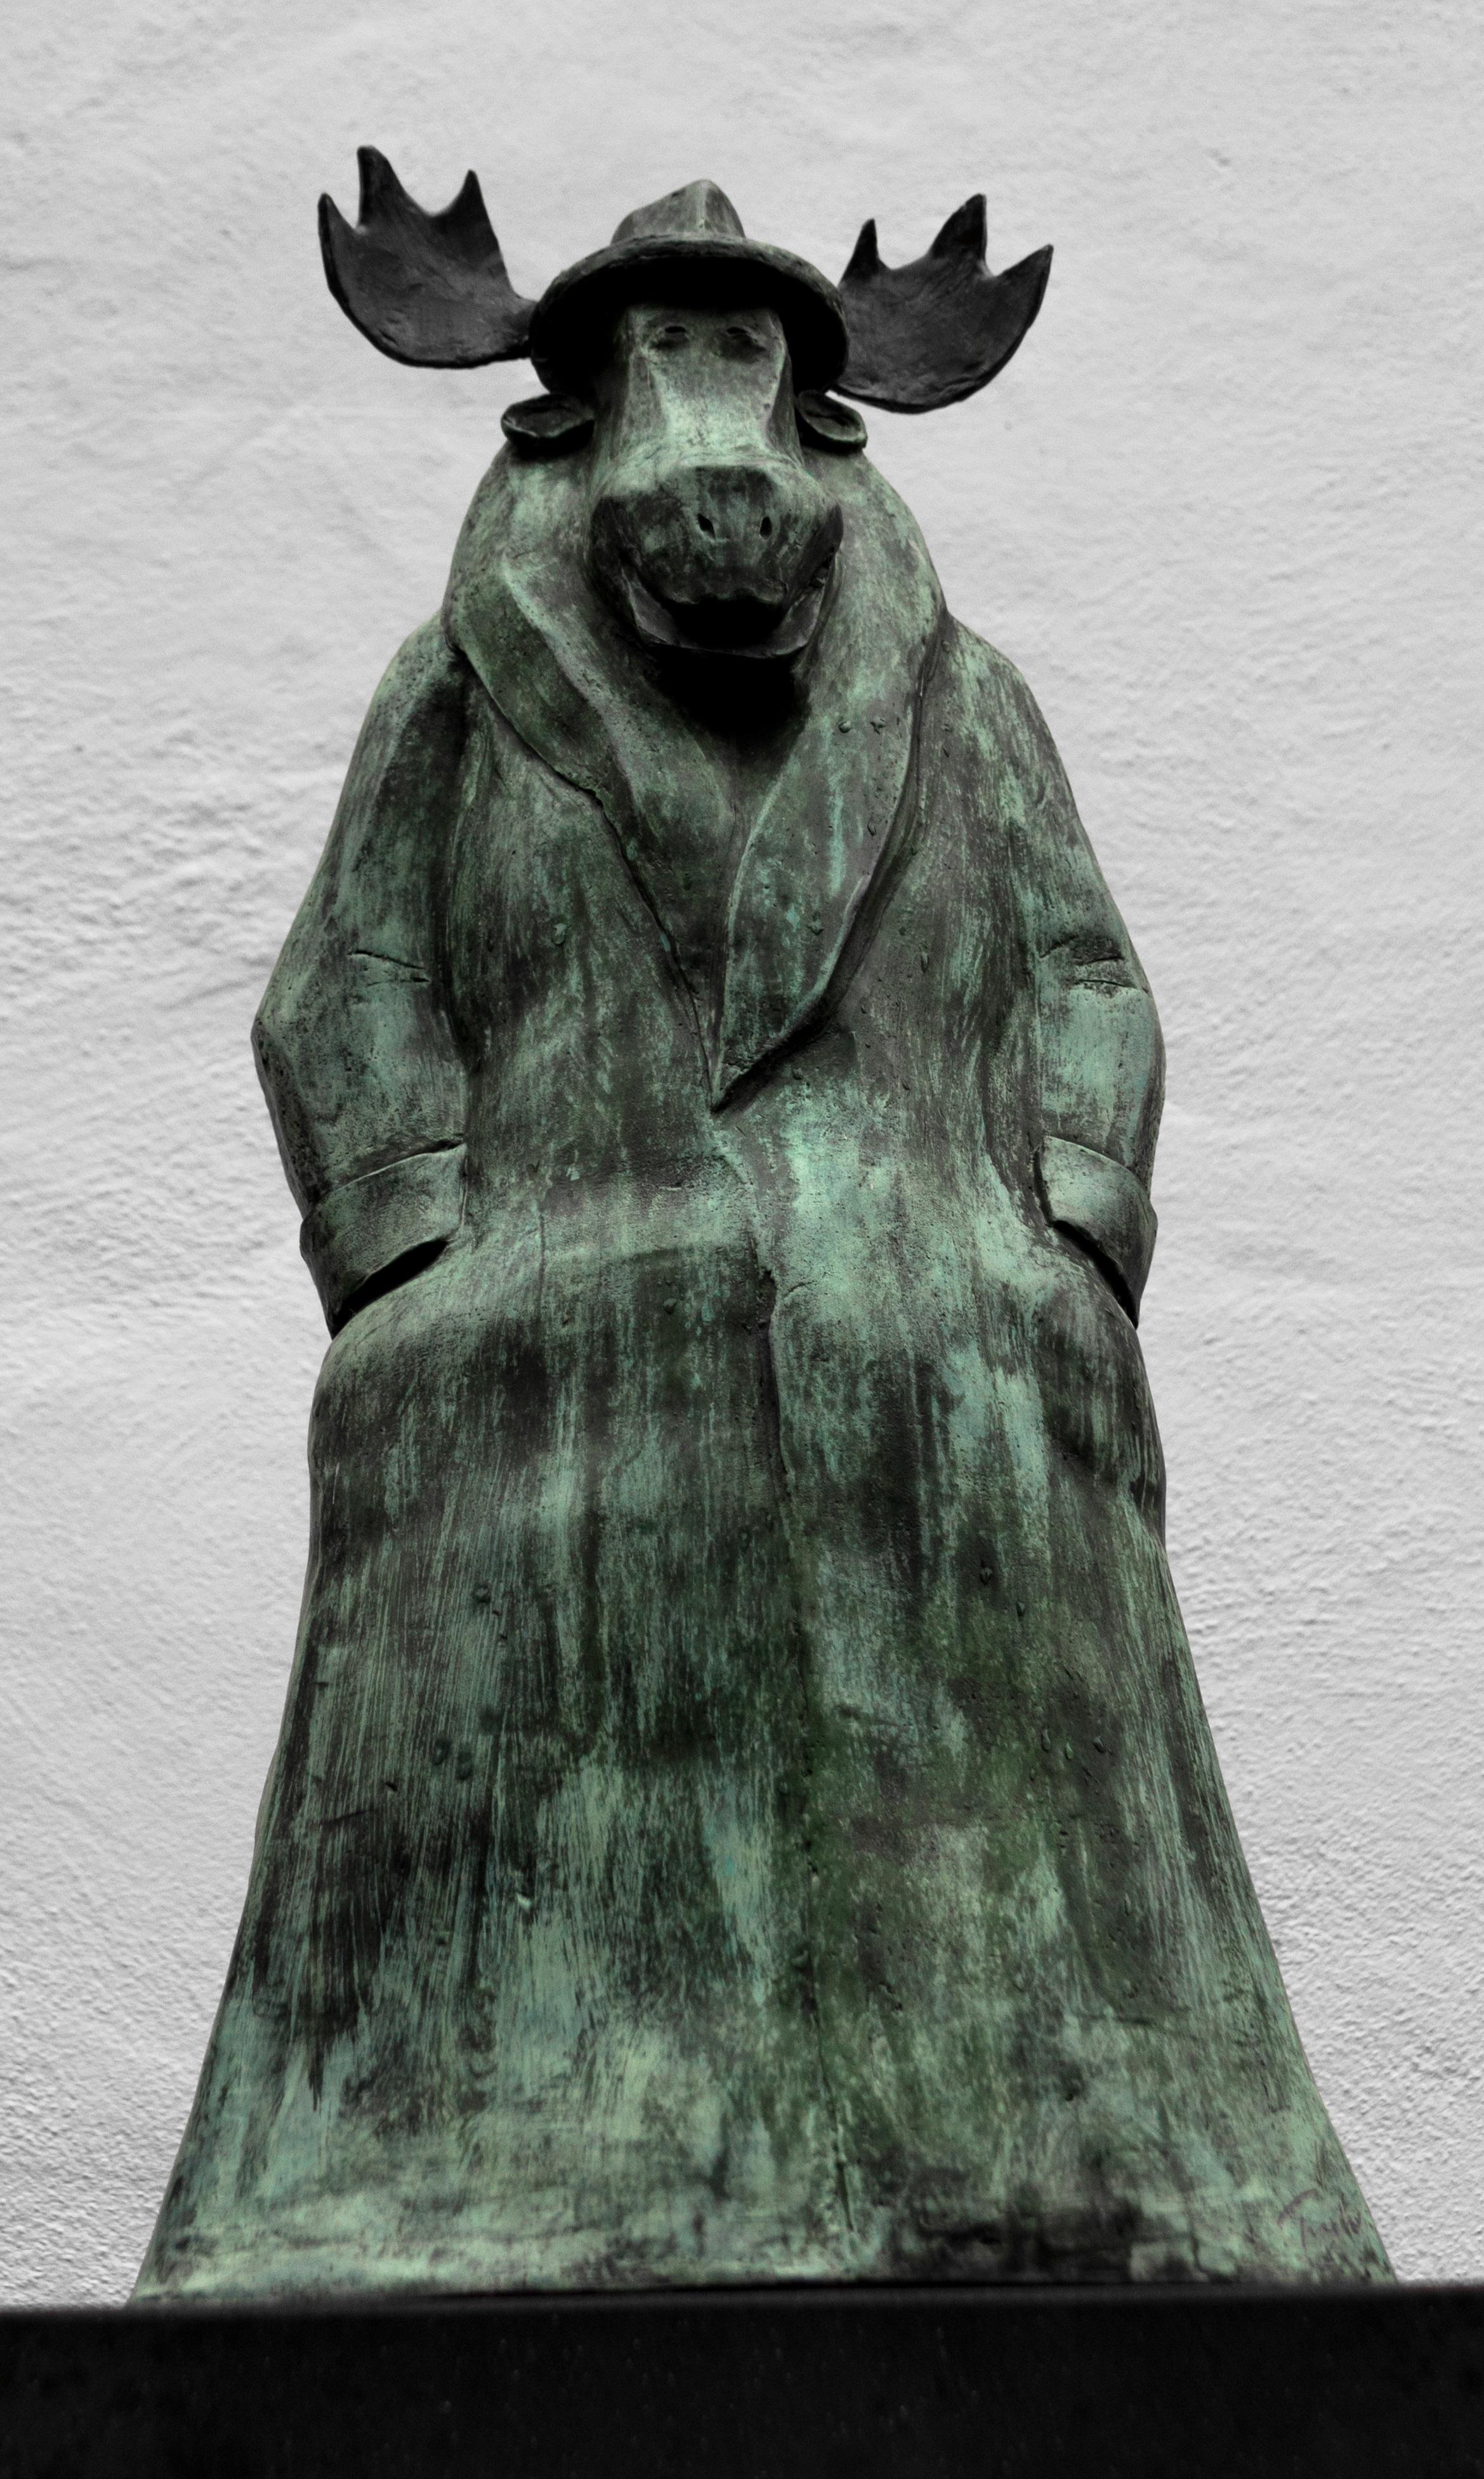 Gambar Monumen Patung Museum Topi Hitam Seni Sketsa Gambar